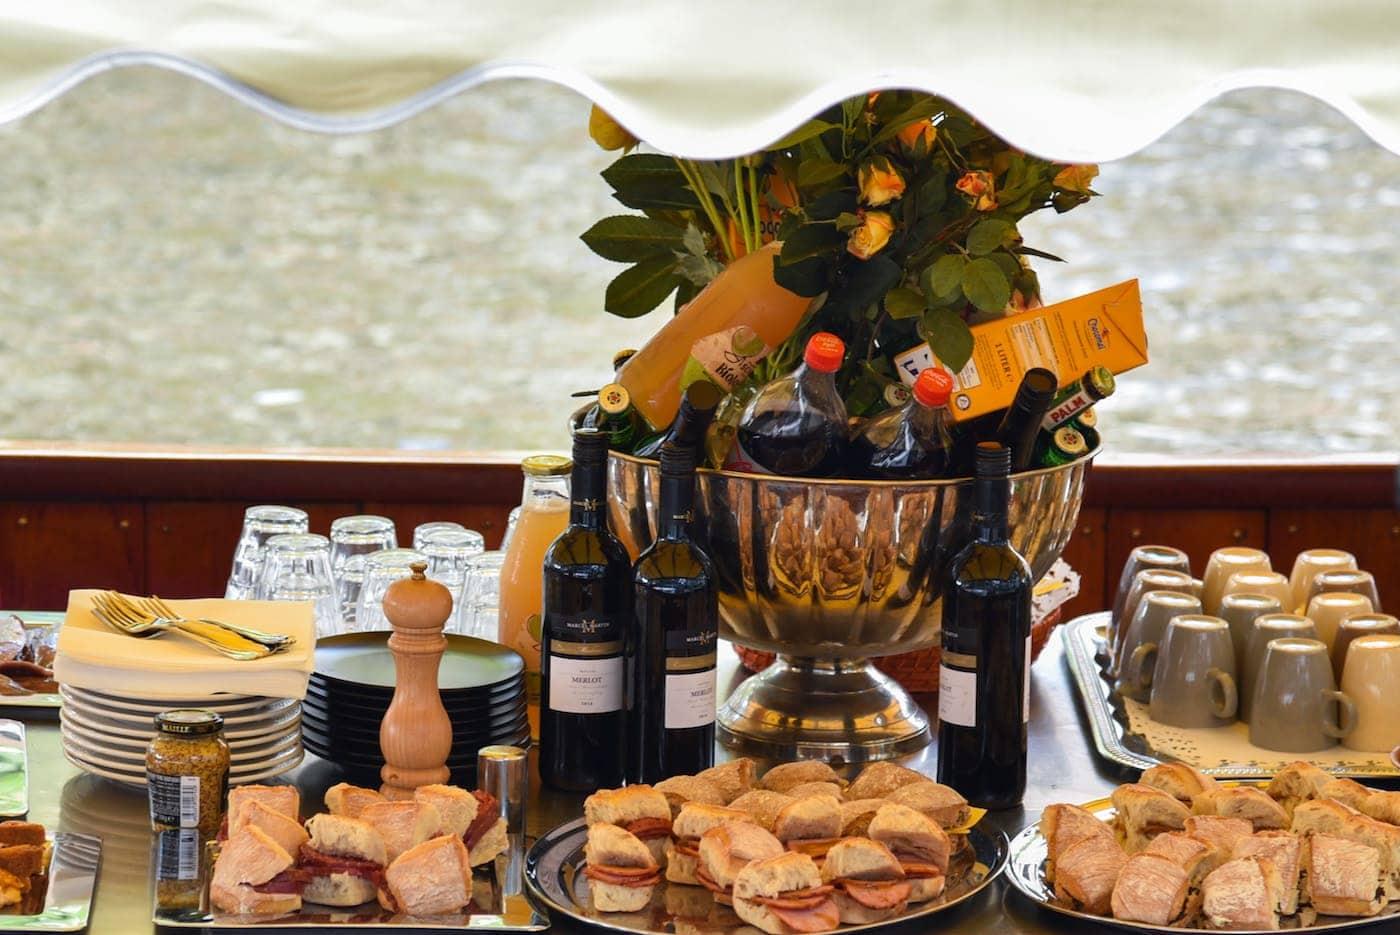 Broodjes boot Amsterdam. De salonboot Avanti